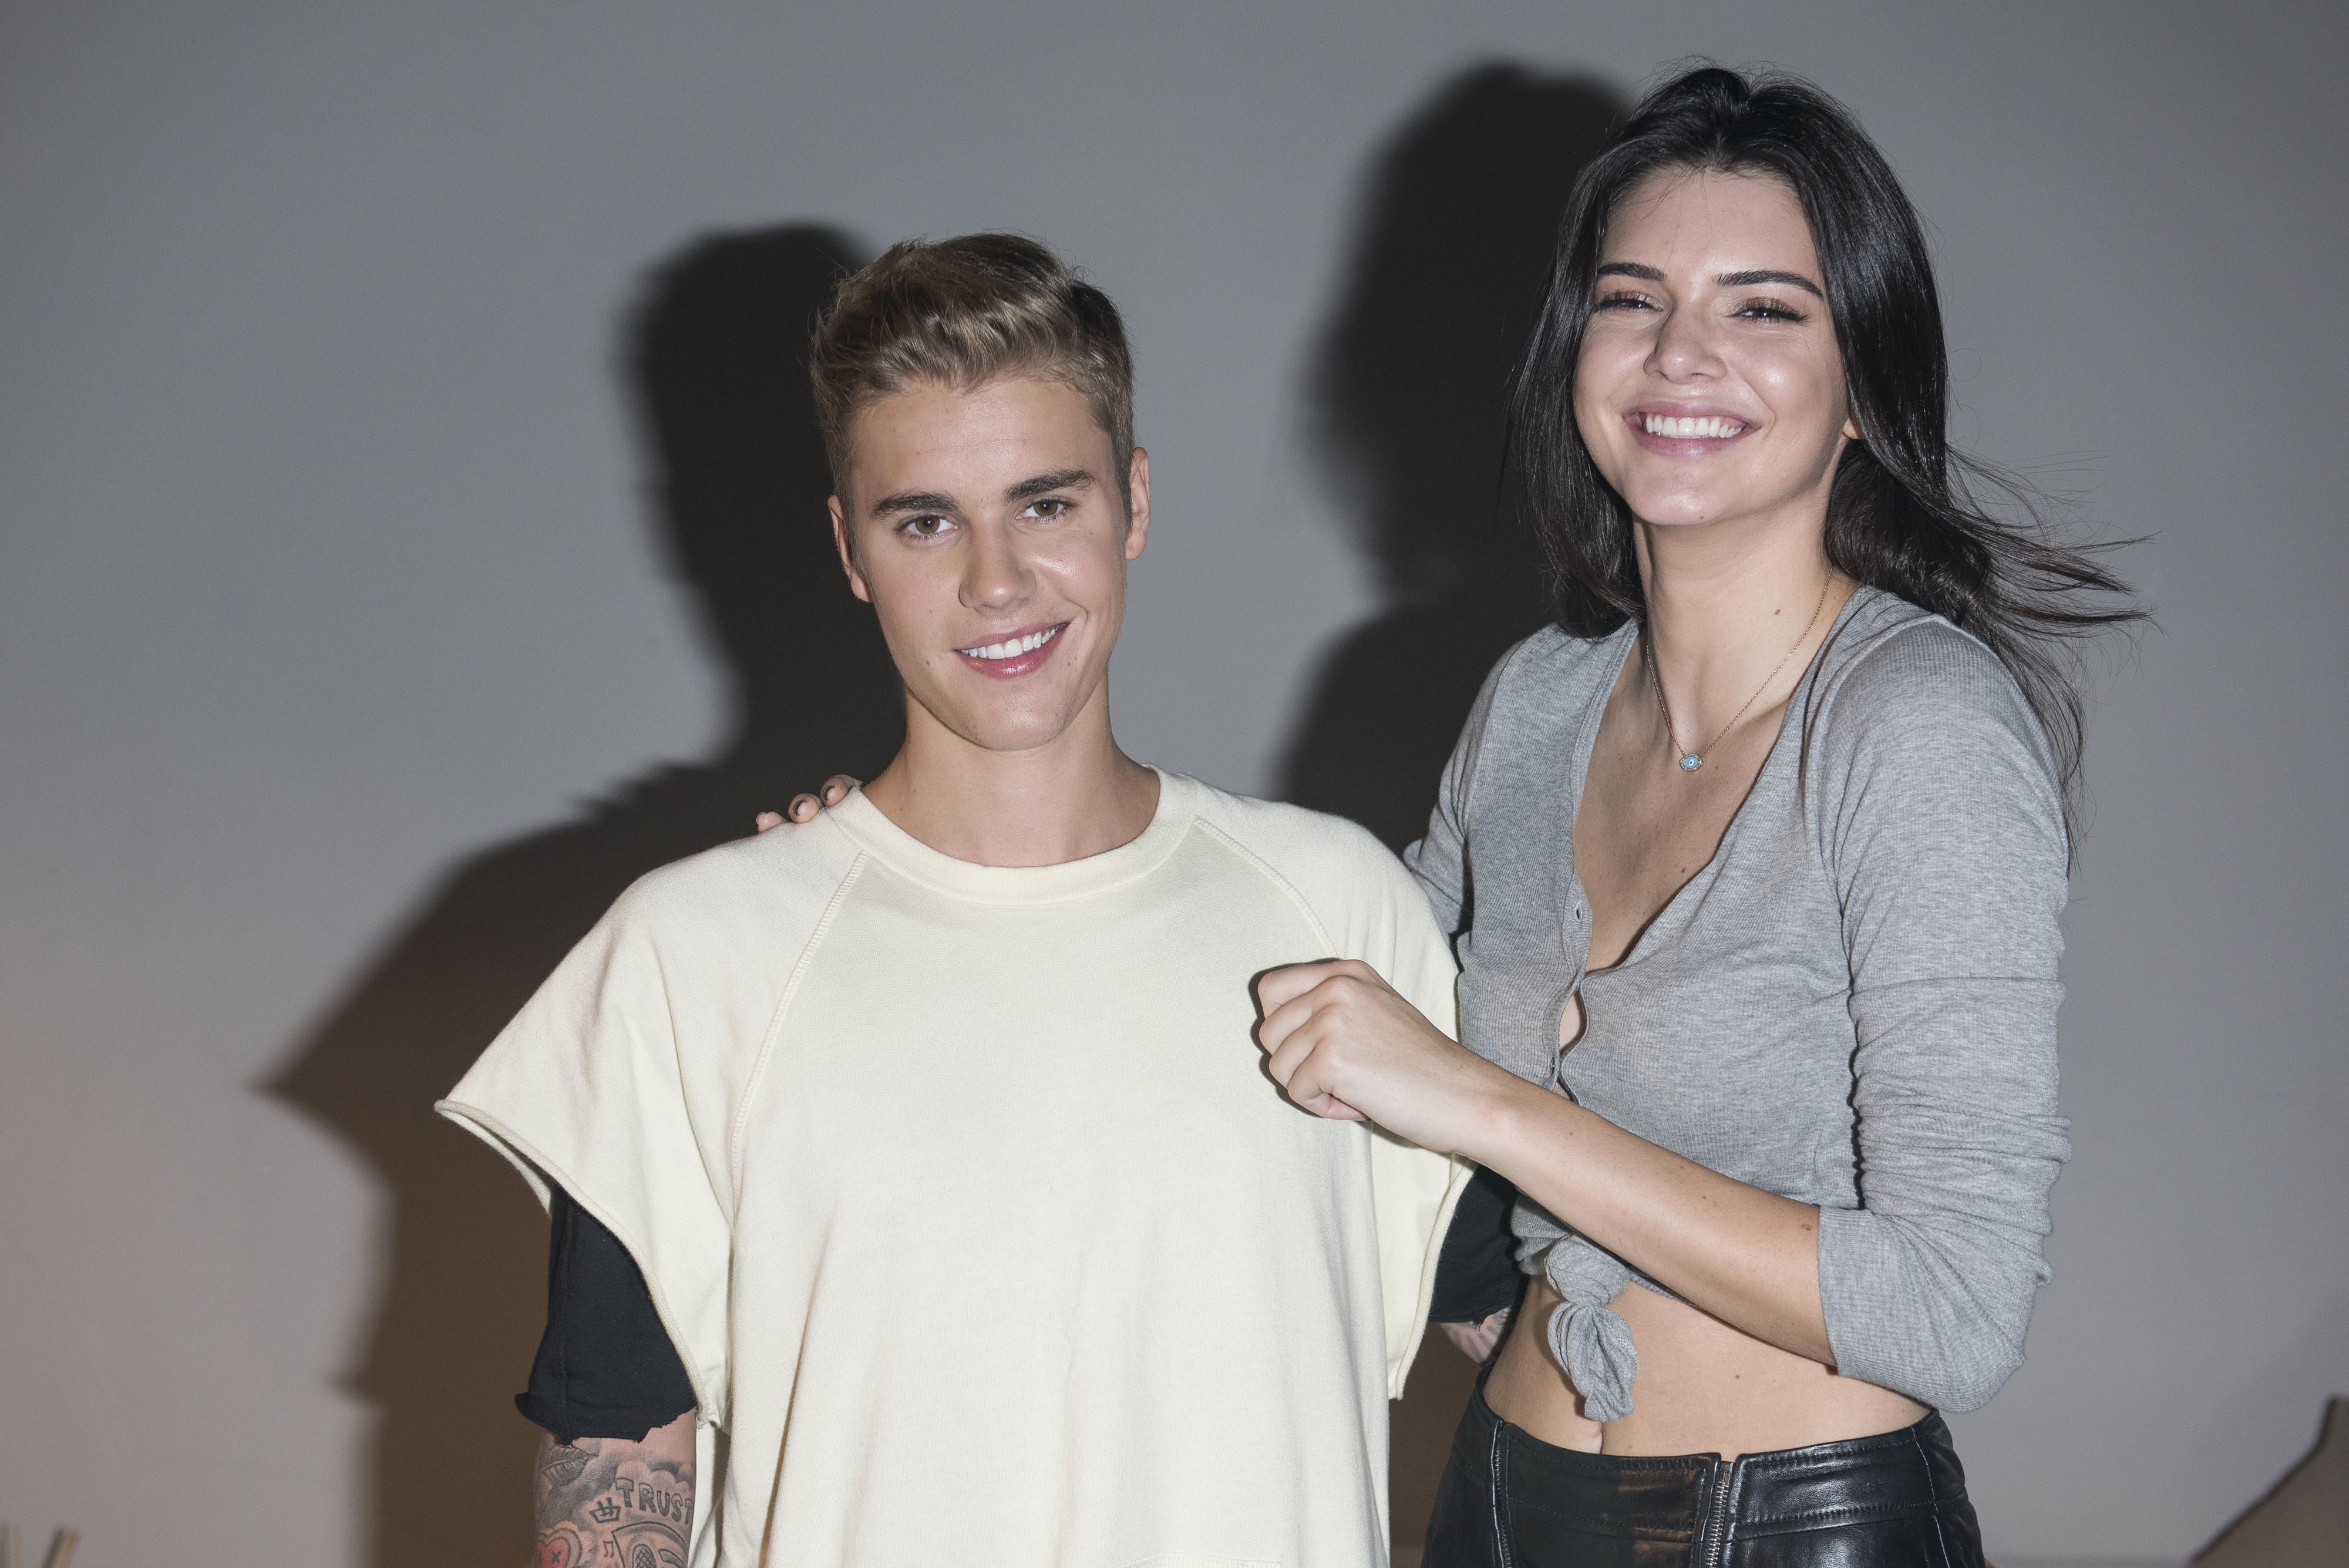 Justin Bieber partilha foto 'má' com Kendall Jenner. Hailey Baldwin riu